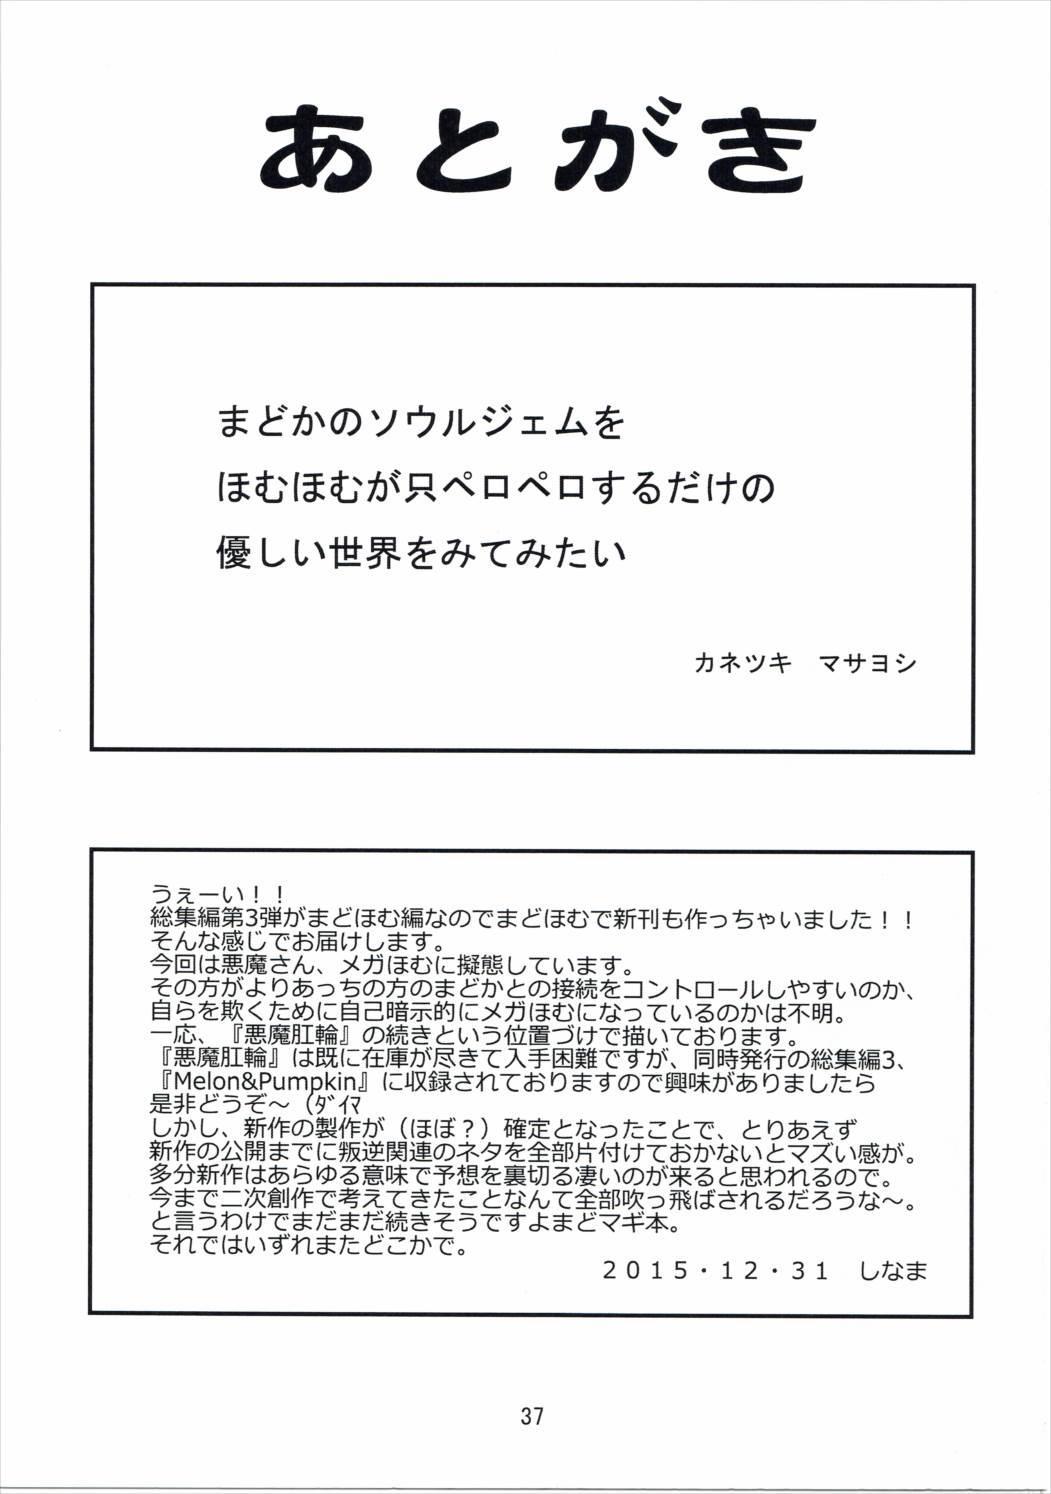 (C89) [KATAMARI-YA (Kanetsuki Masayoshi, Shinama) Noushuku! ! Homumilk (Puella Magi Madoka Magica) 35